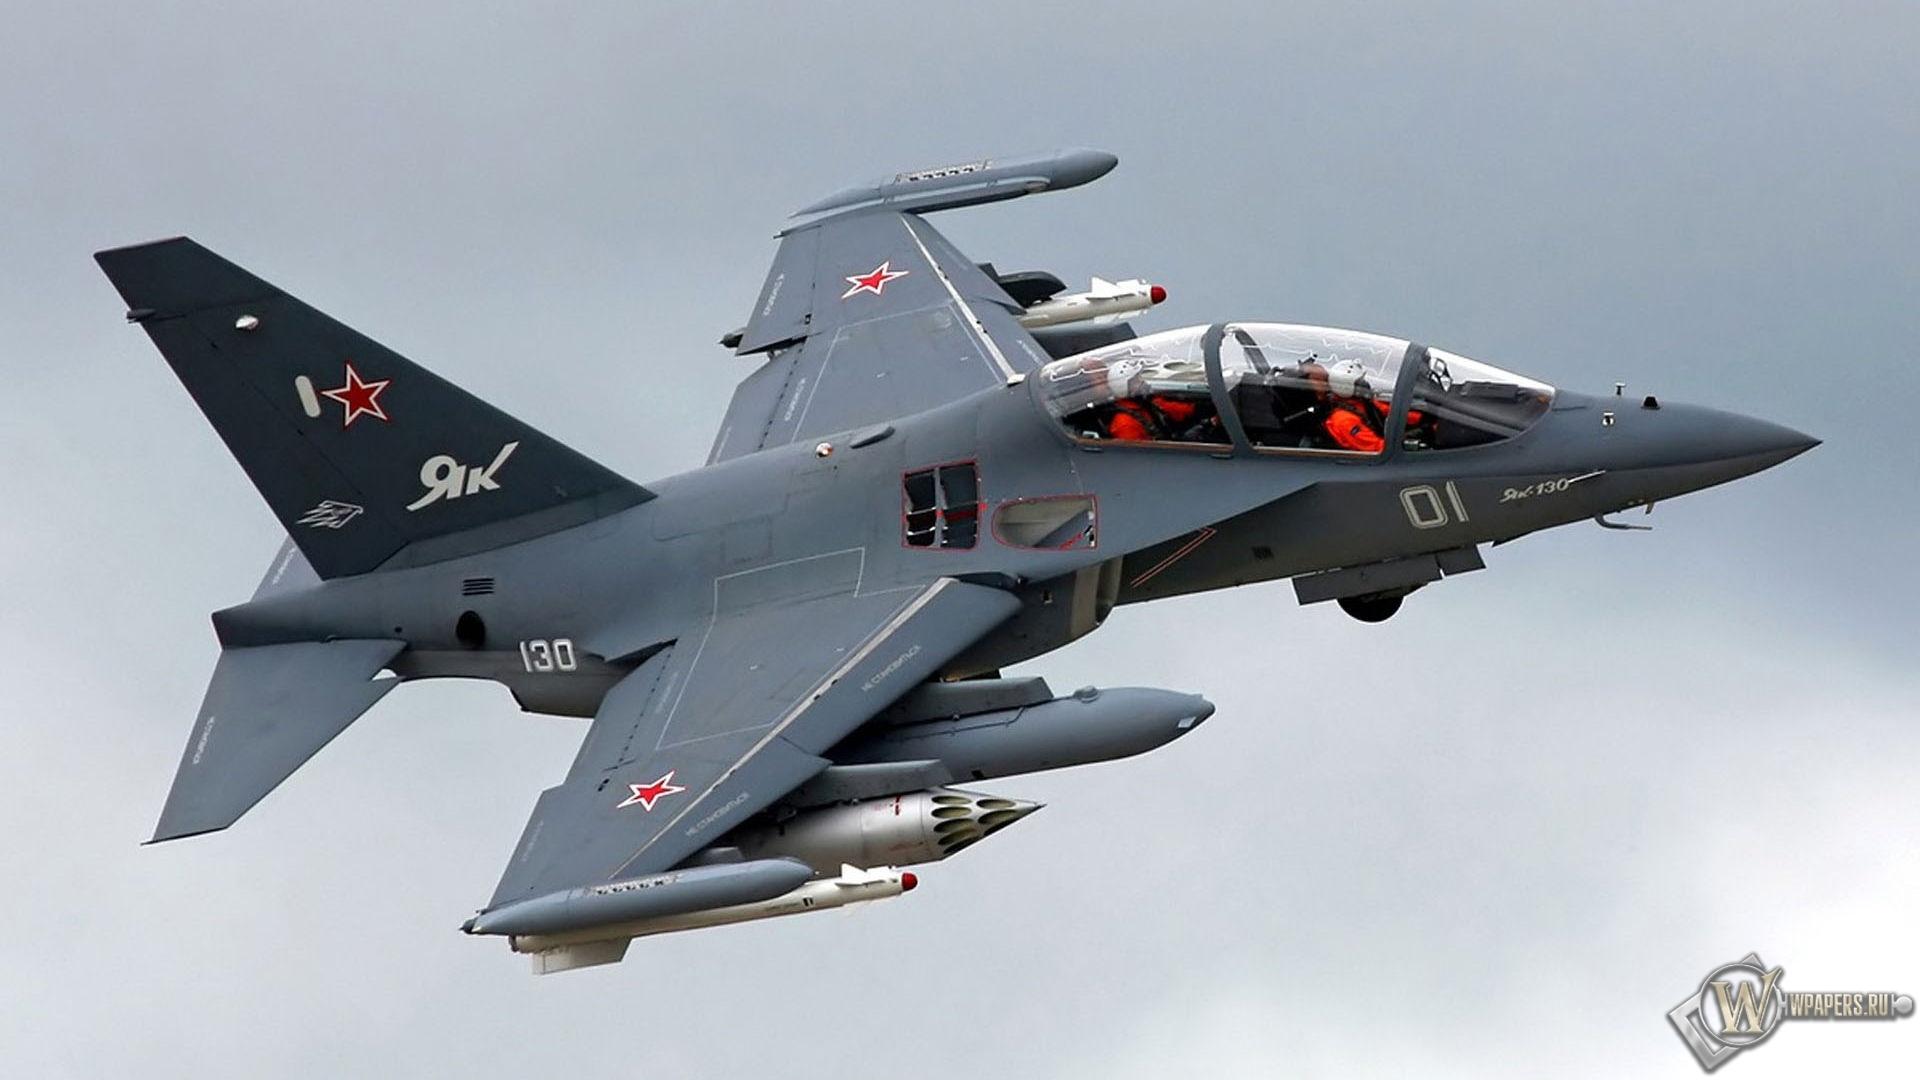 Як-130 1920x1080